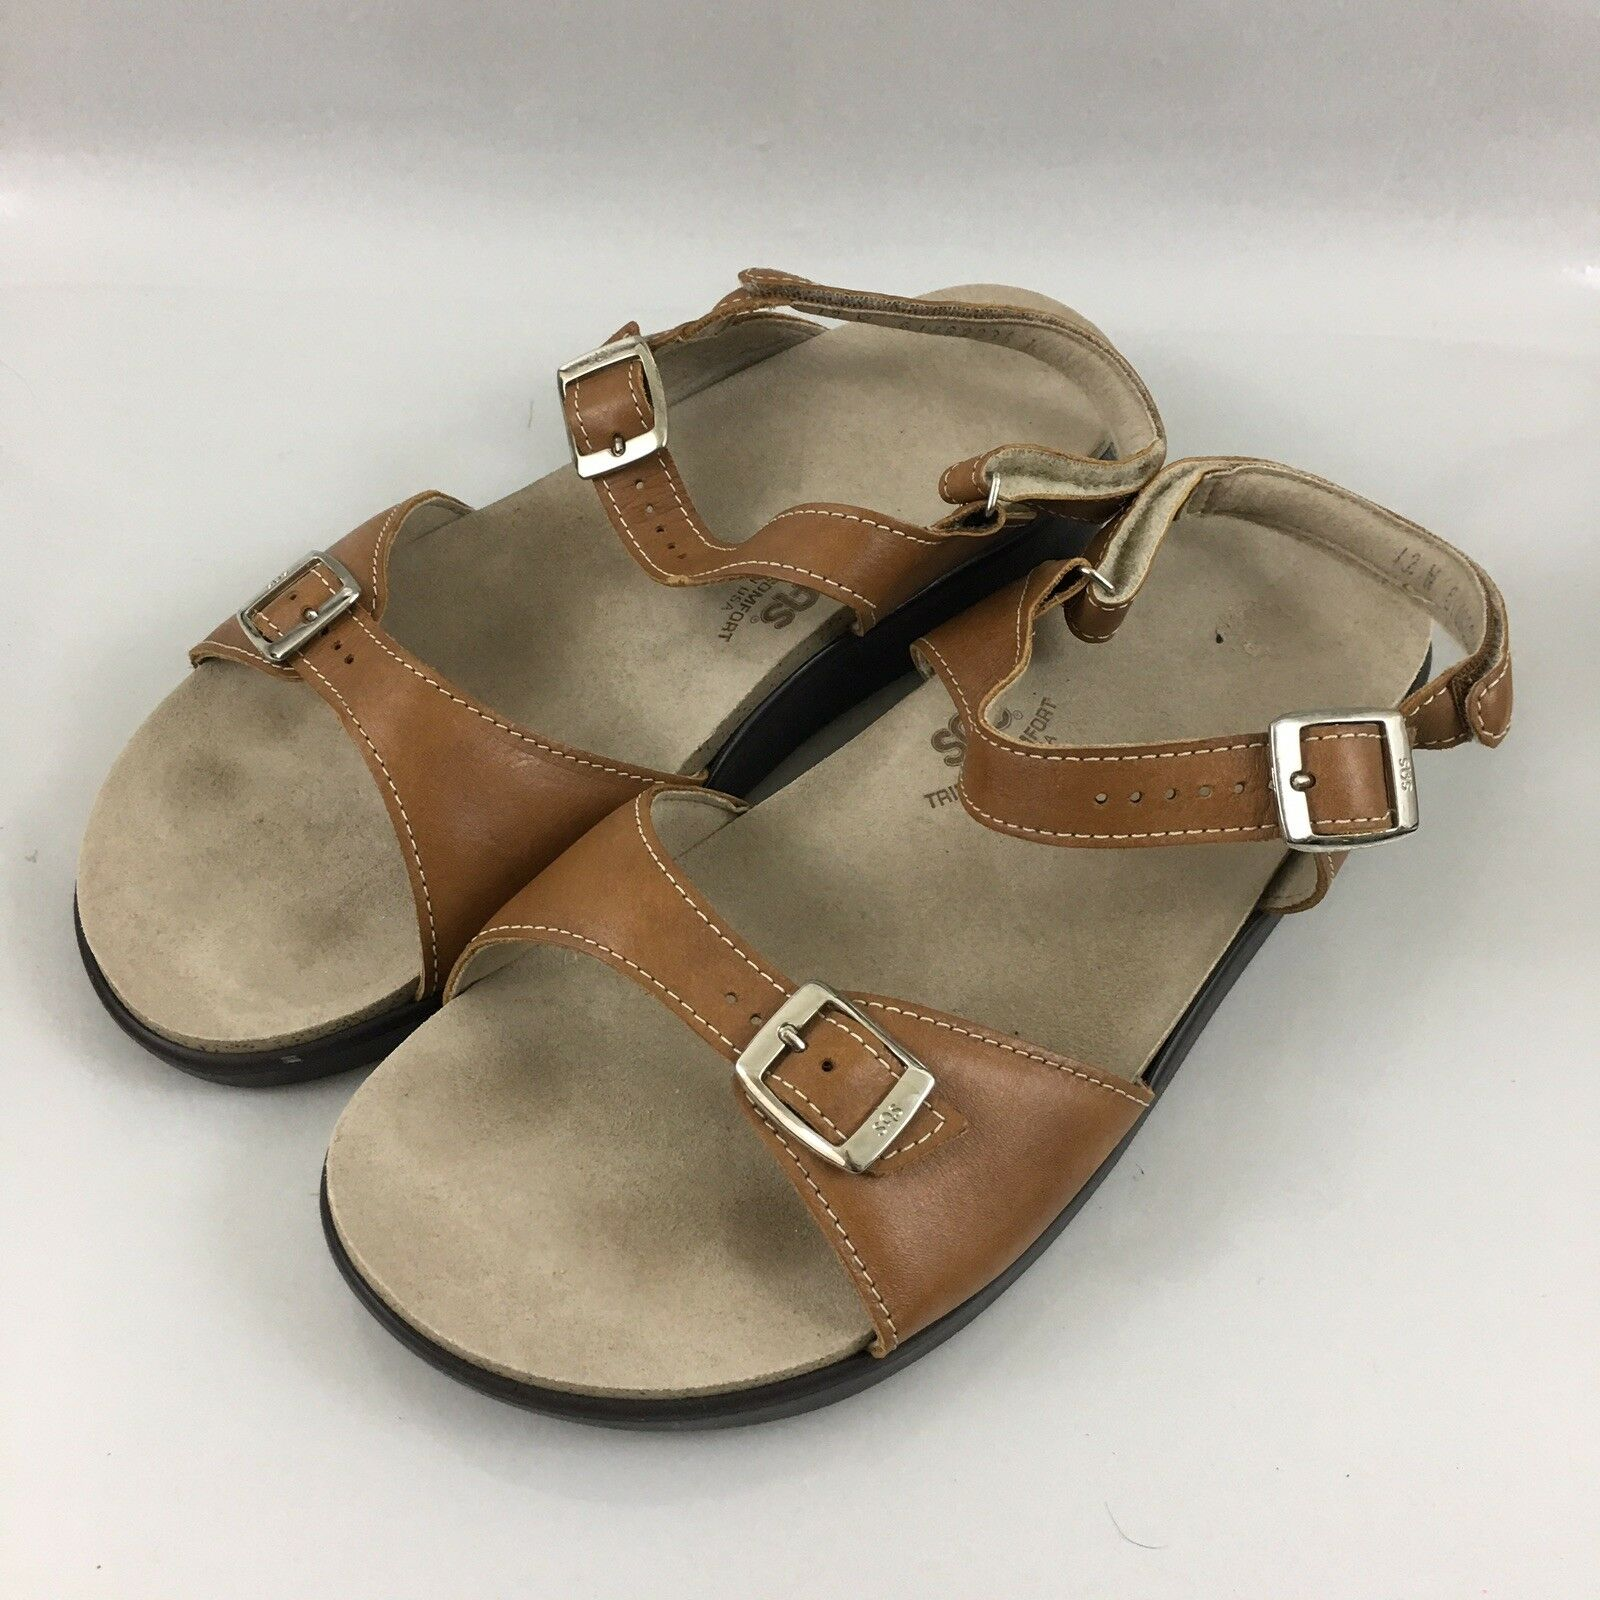 SAS Tripad Comfort Sandals Caramel Leather shoes 12 Wide 12 W